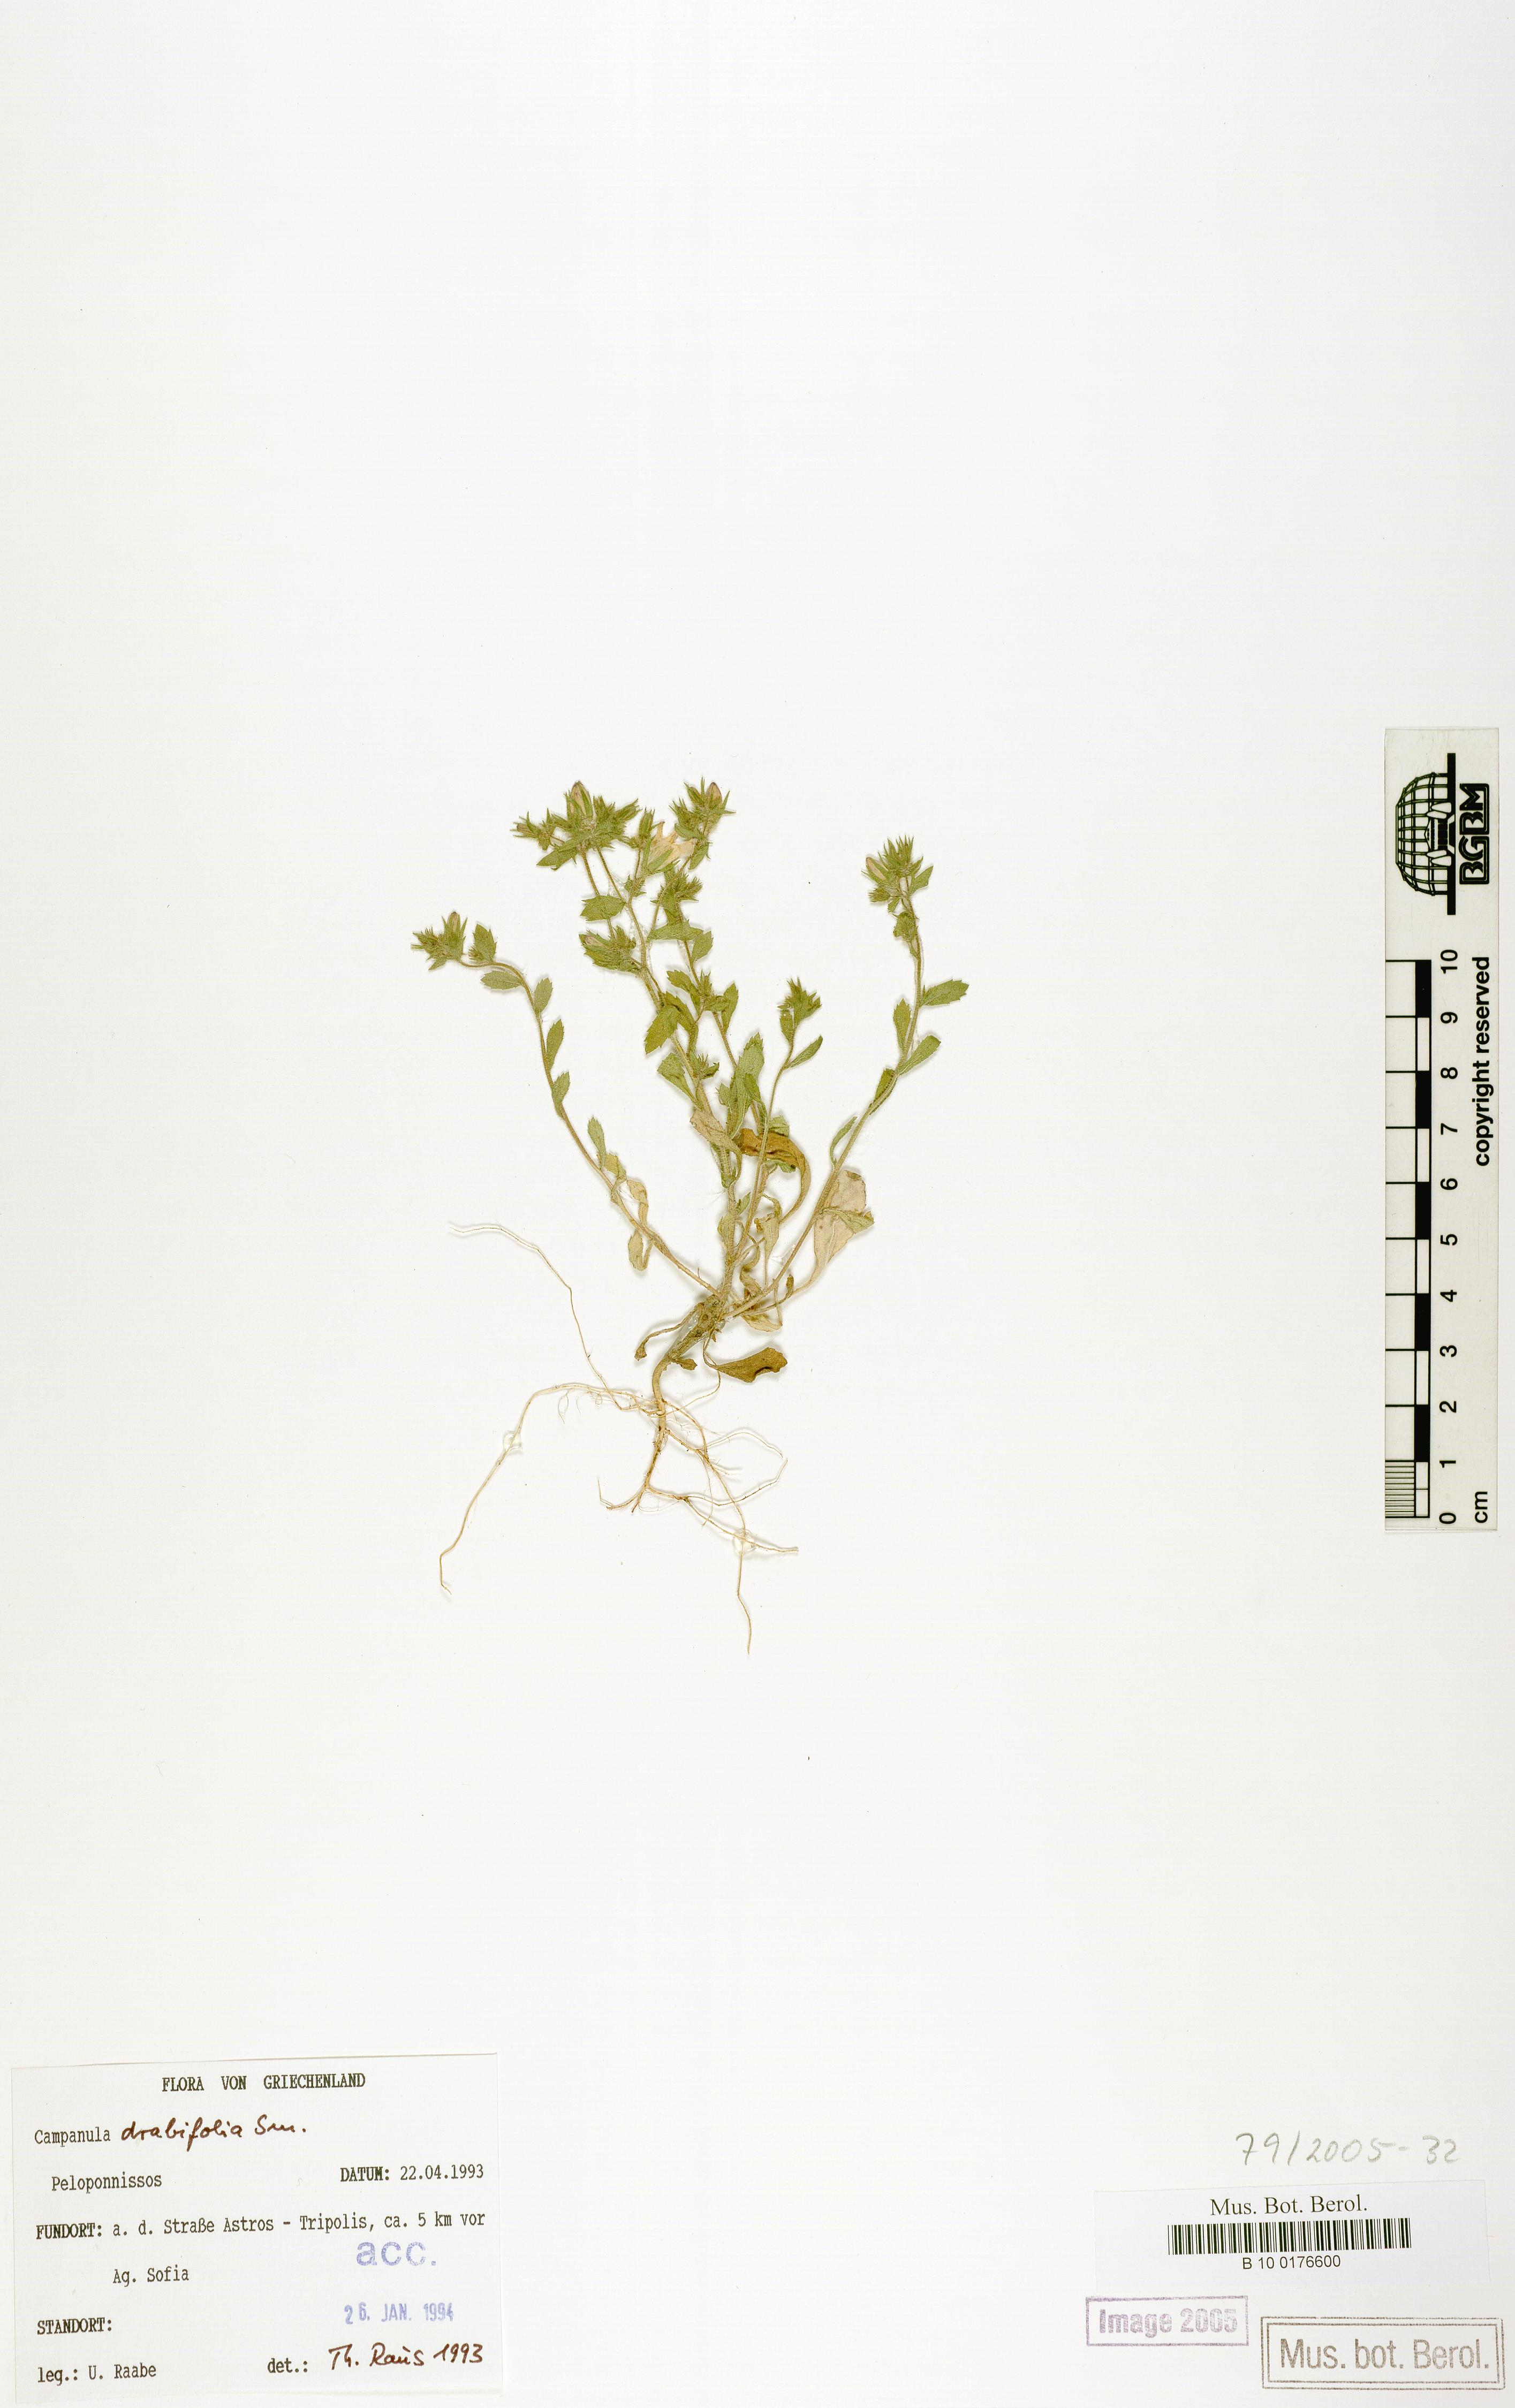 http://ww2.bgbm.org/herbarium/images/B/10/01/76/60/B_10_0176600.jpg